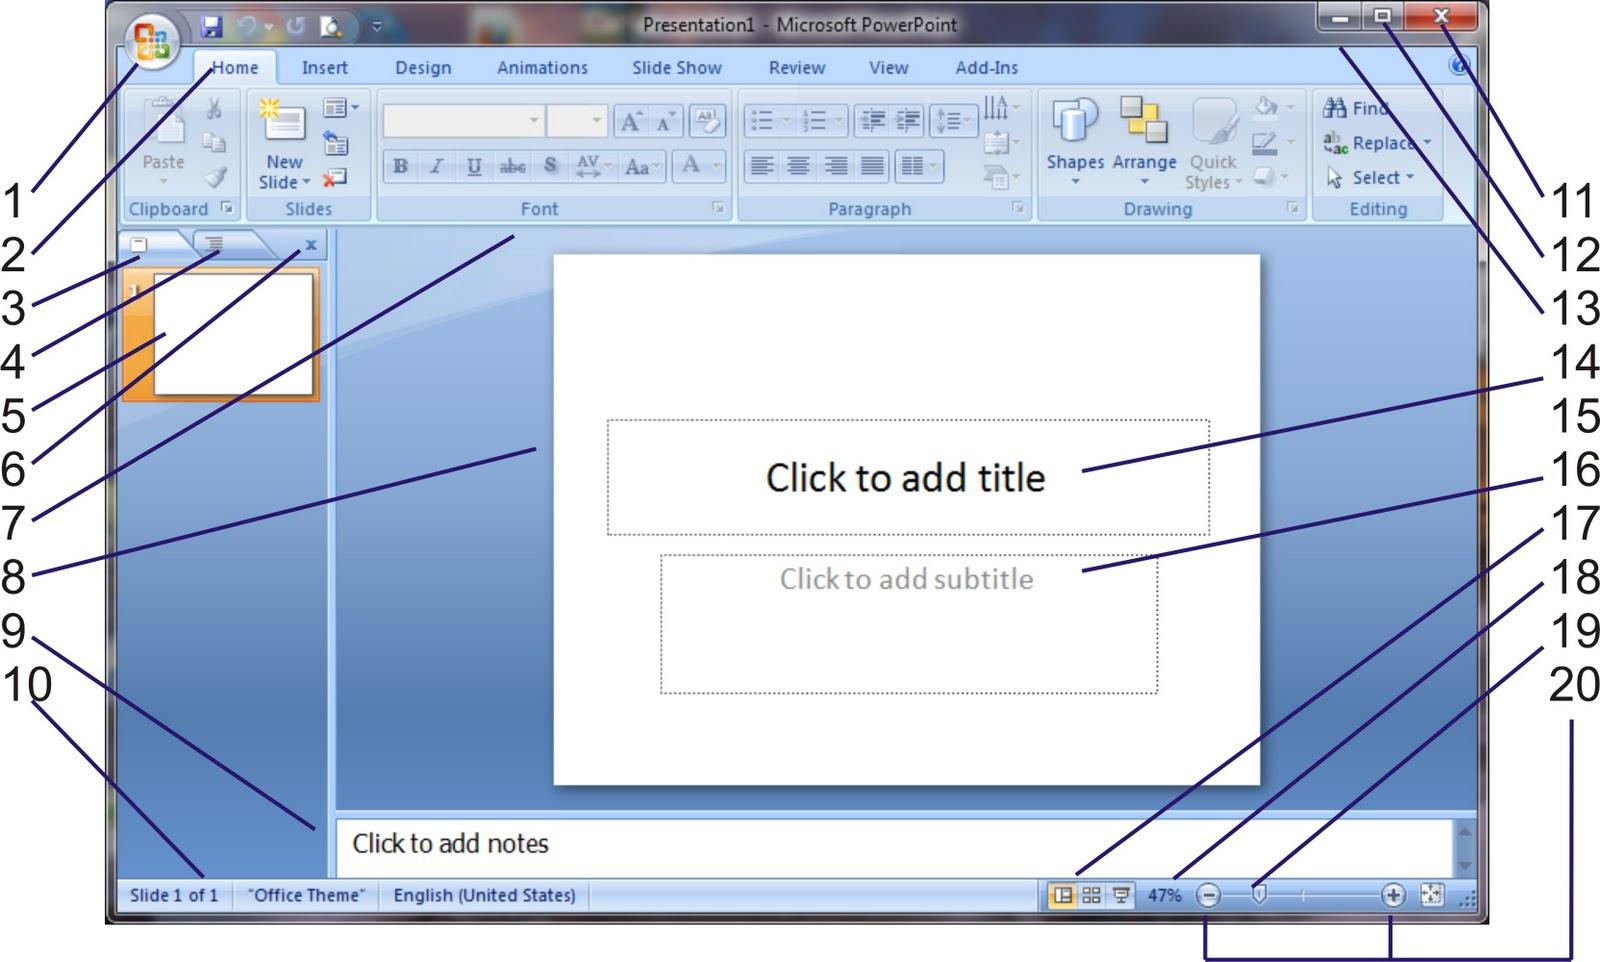 Bayudhas Notizen Catatan Bayudha Microsoft Powerpoint